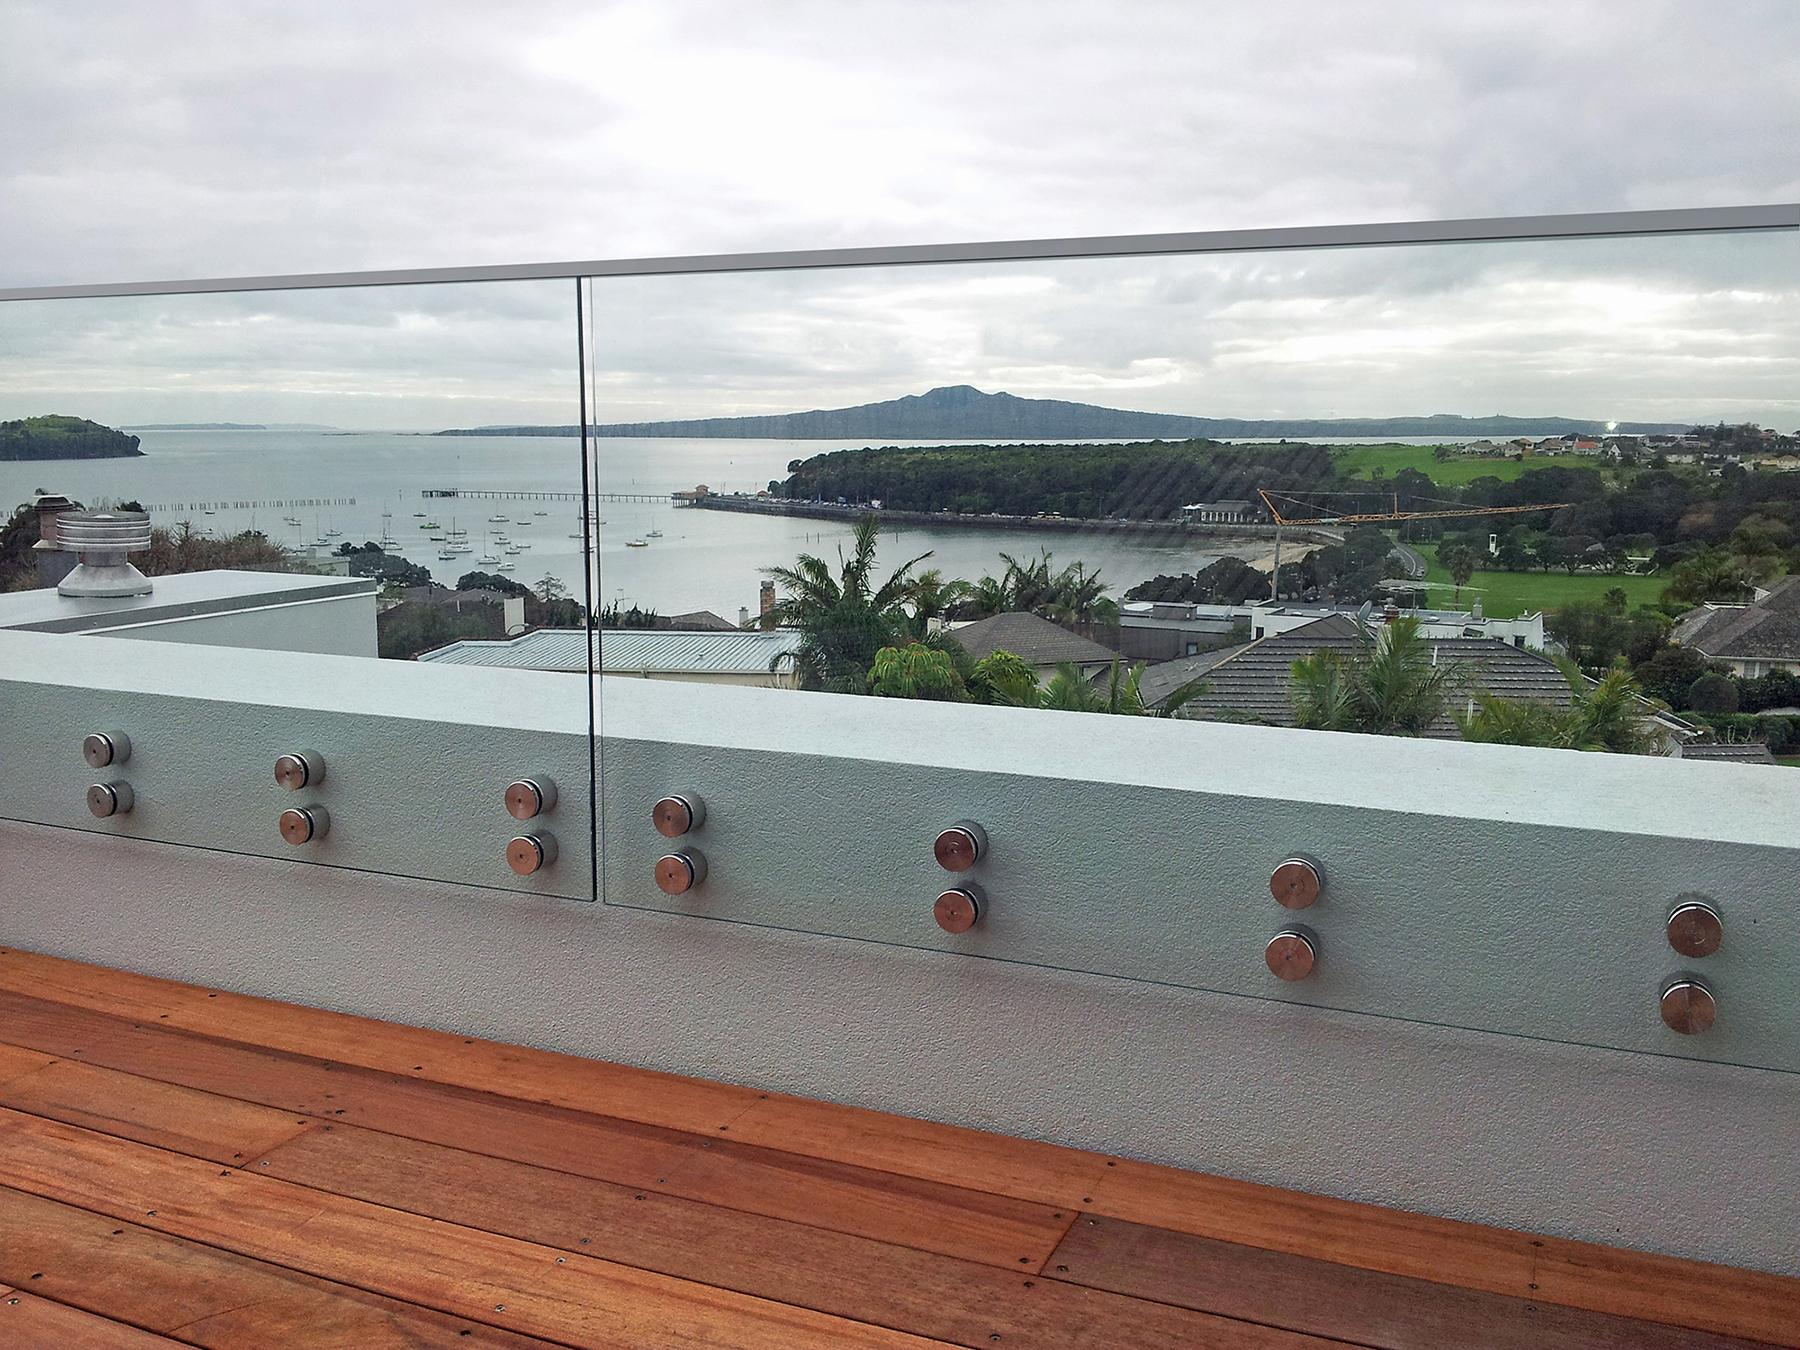 Frameless Balustrades - Juralco Balustrade Systems NZ - Juralco Balustrades - Glass or Aluminium